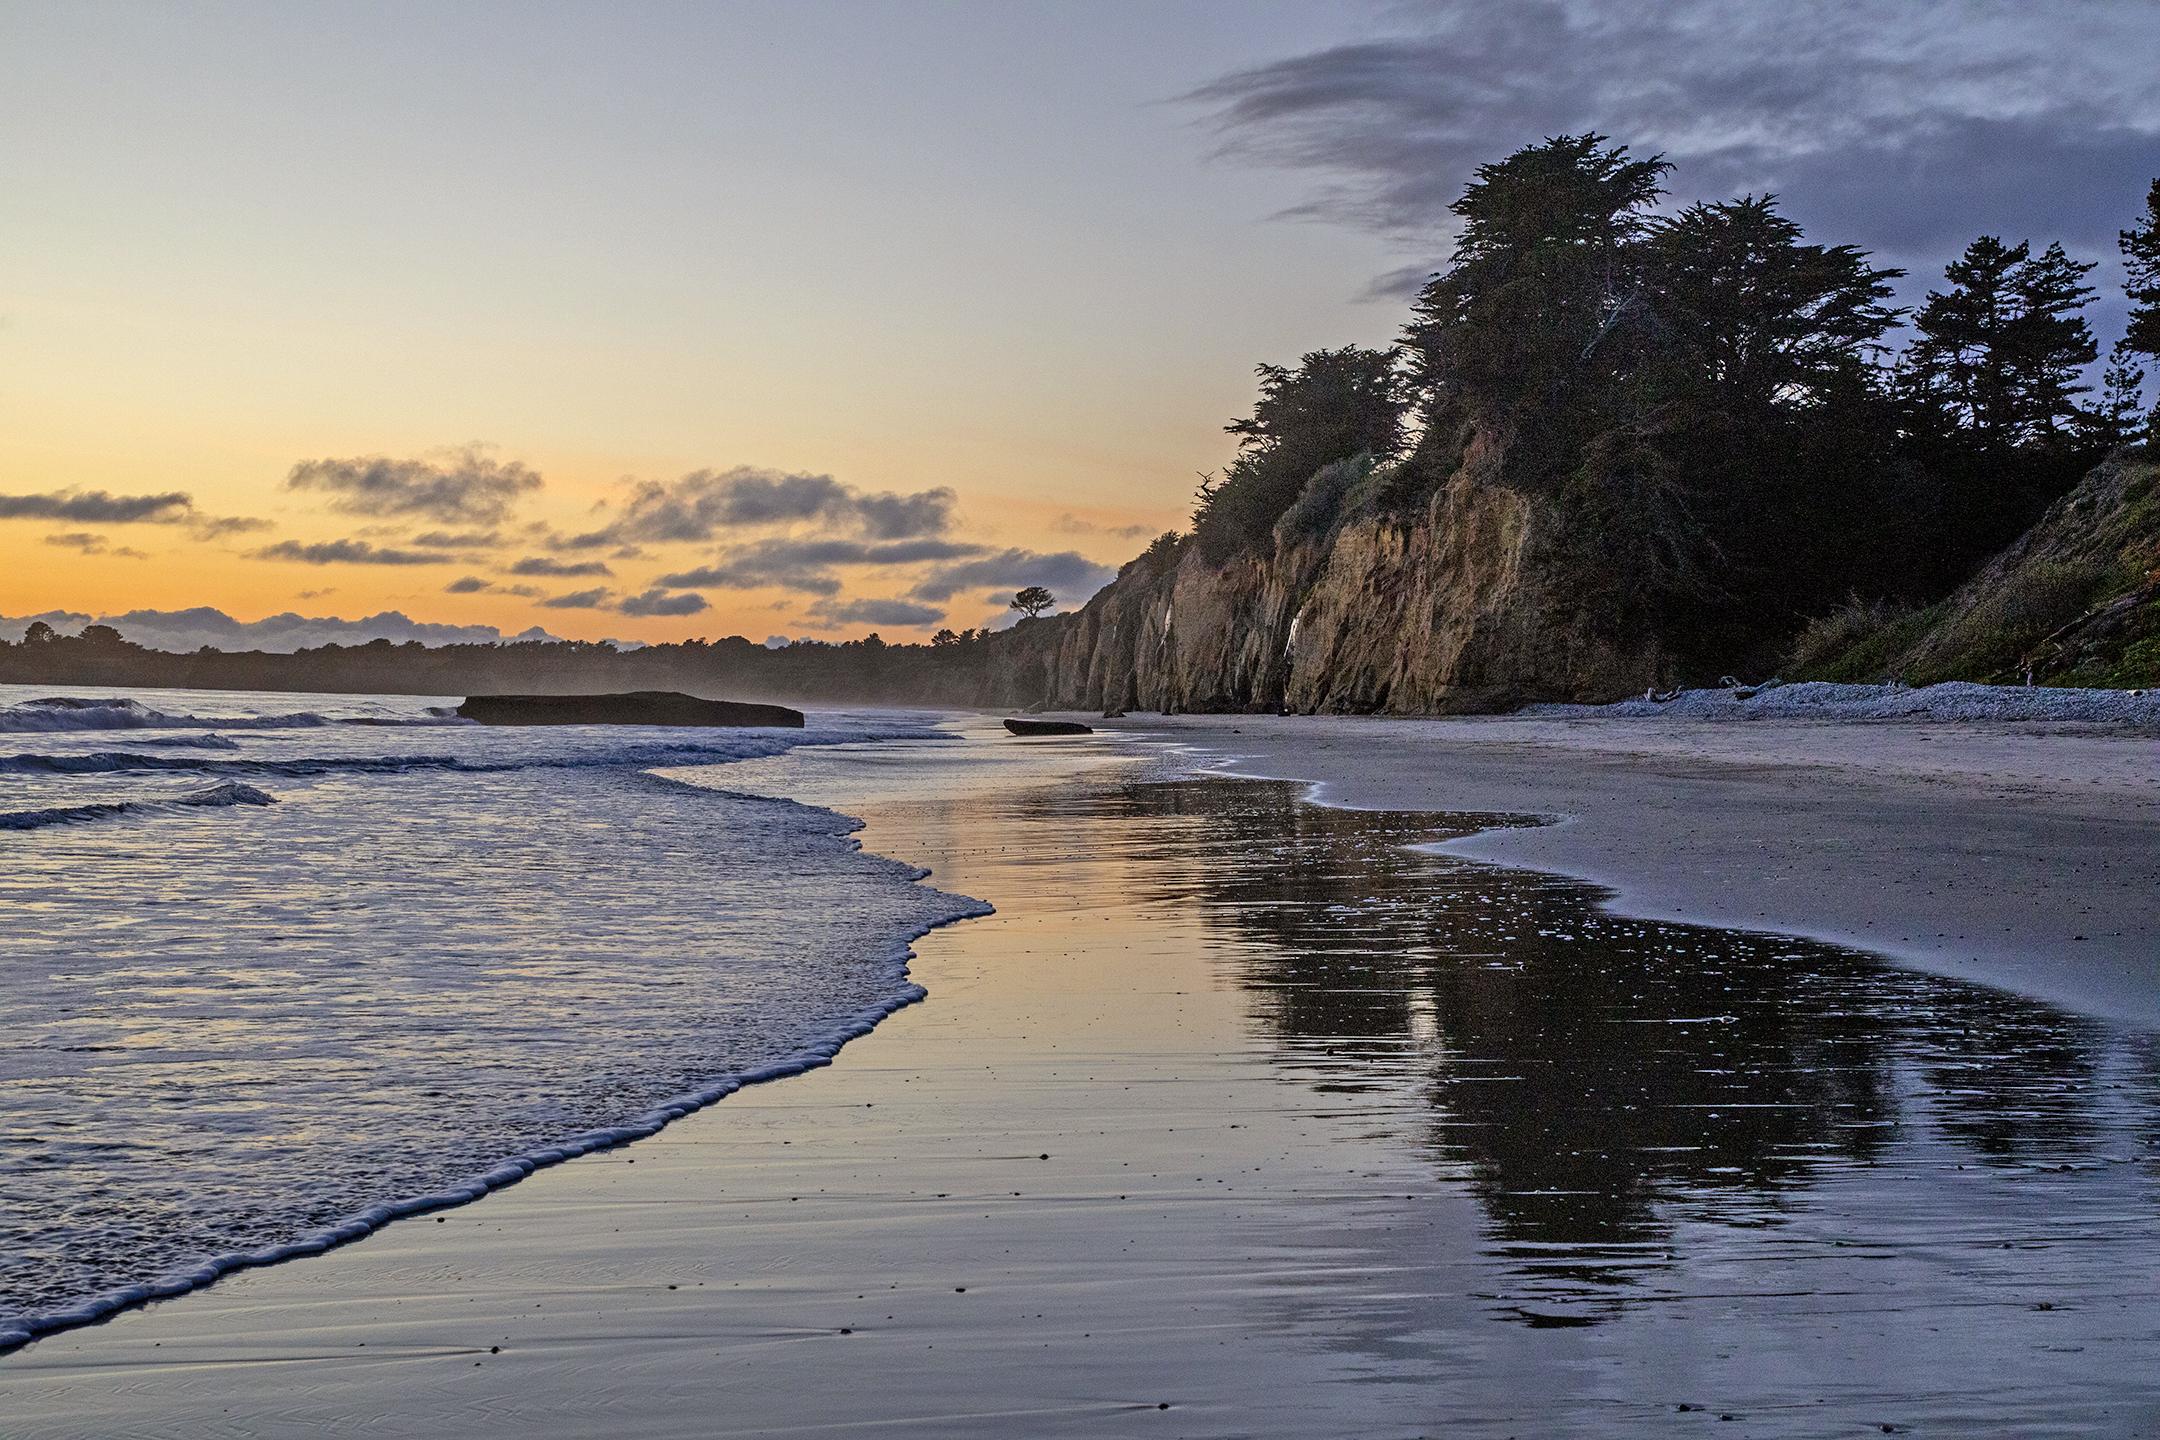 Cove Beach Sunset 1 - Carla Brennan